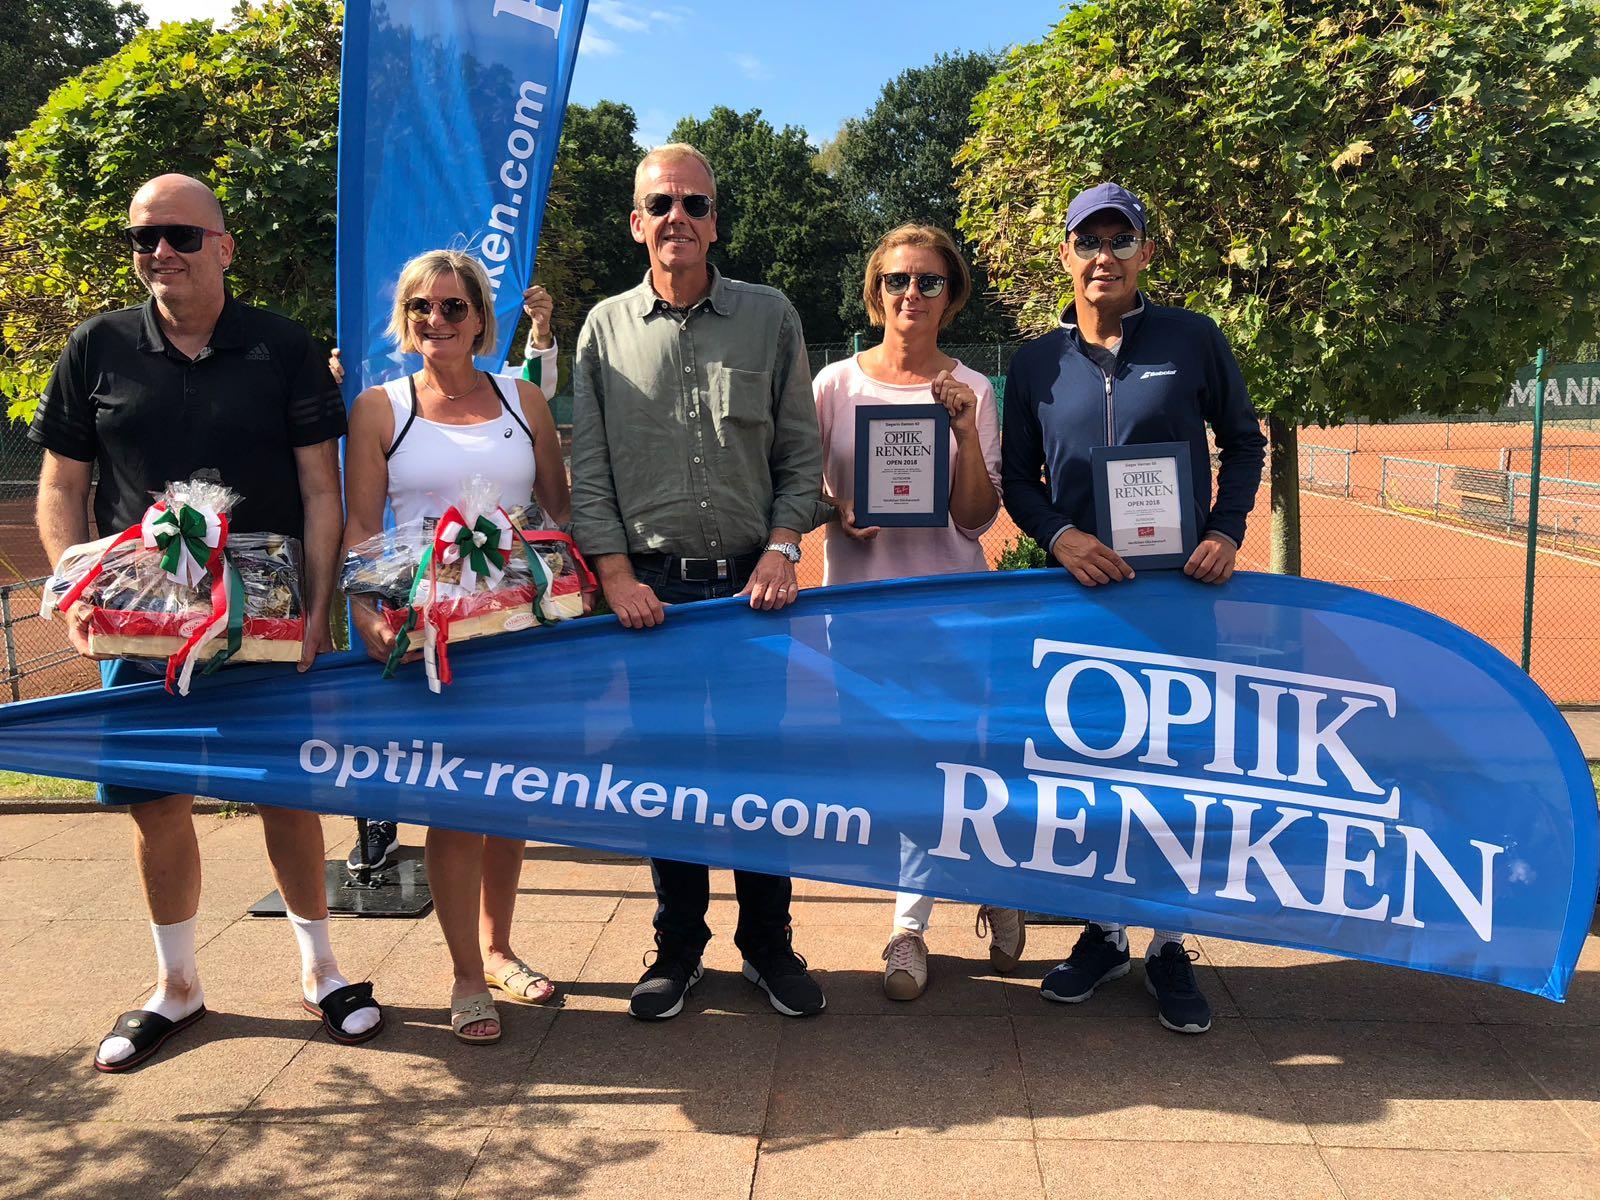 Jörg Althans (Finalist Herren 50), Claudia Wipijewski (Finalistin Damen 40), Thomas Renken (Sponsor), Anja Sunderbrink (Siegerin Damen 40), Axel Seemann (Sieger Herren 50)